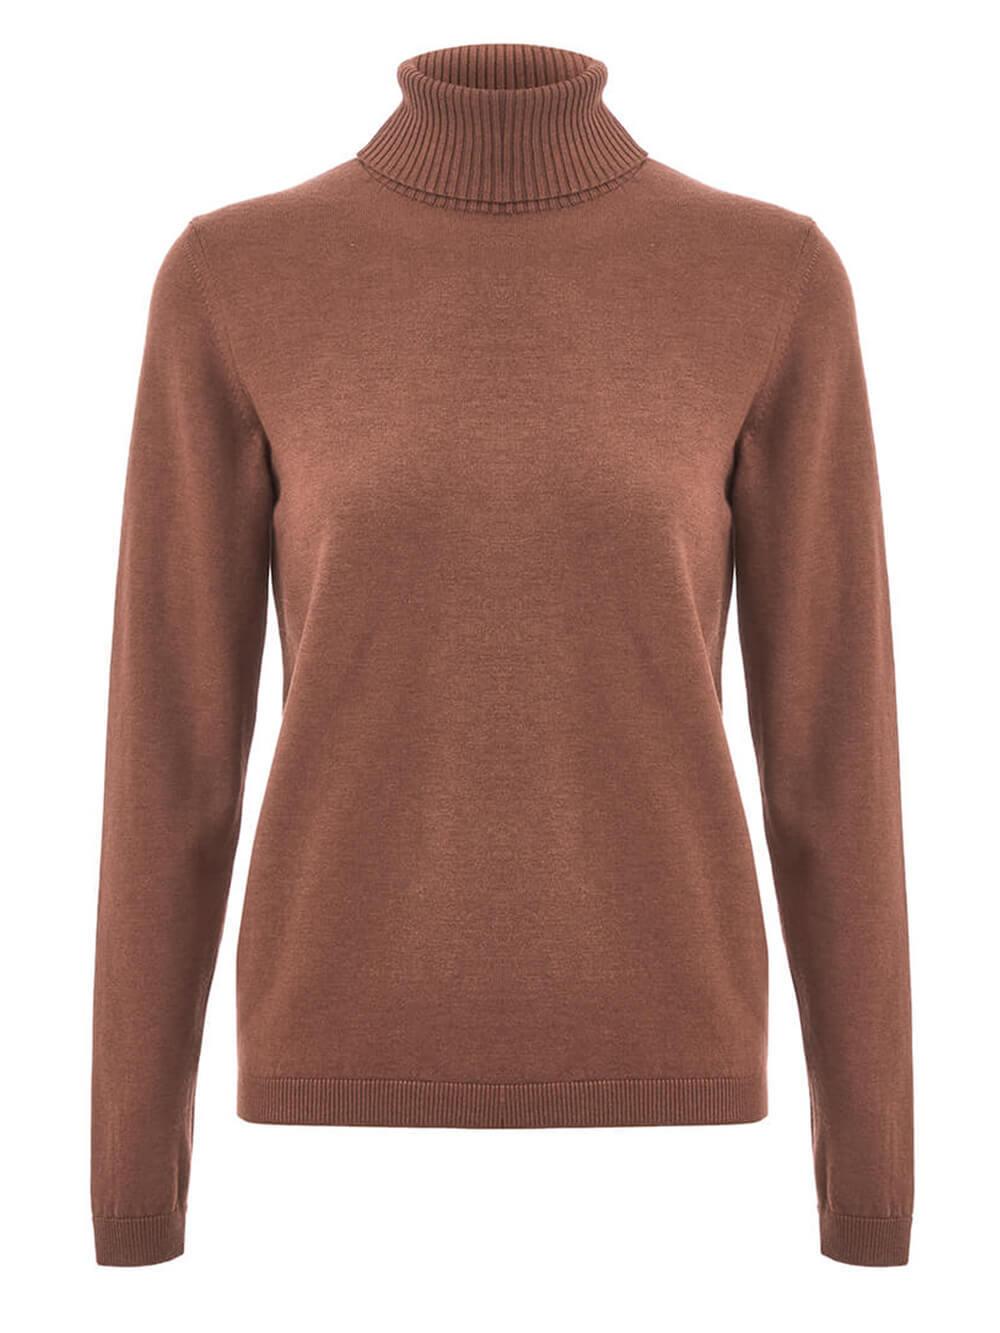 Женская водолазка коричневого цвета из шерсти и шелка - фото 1